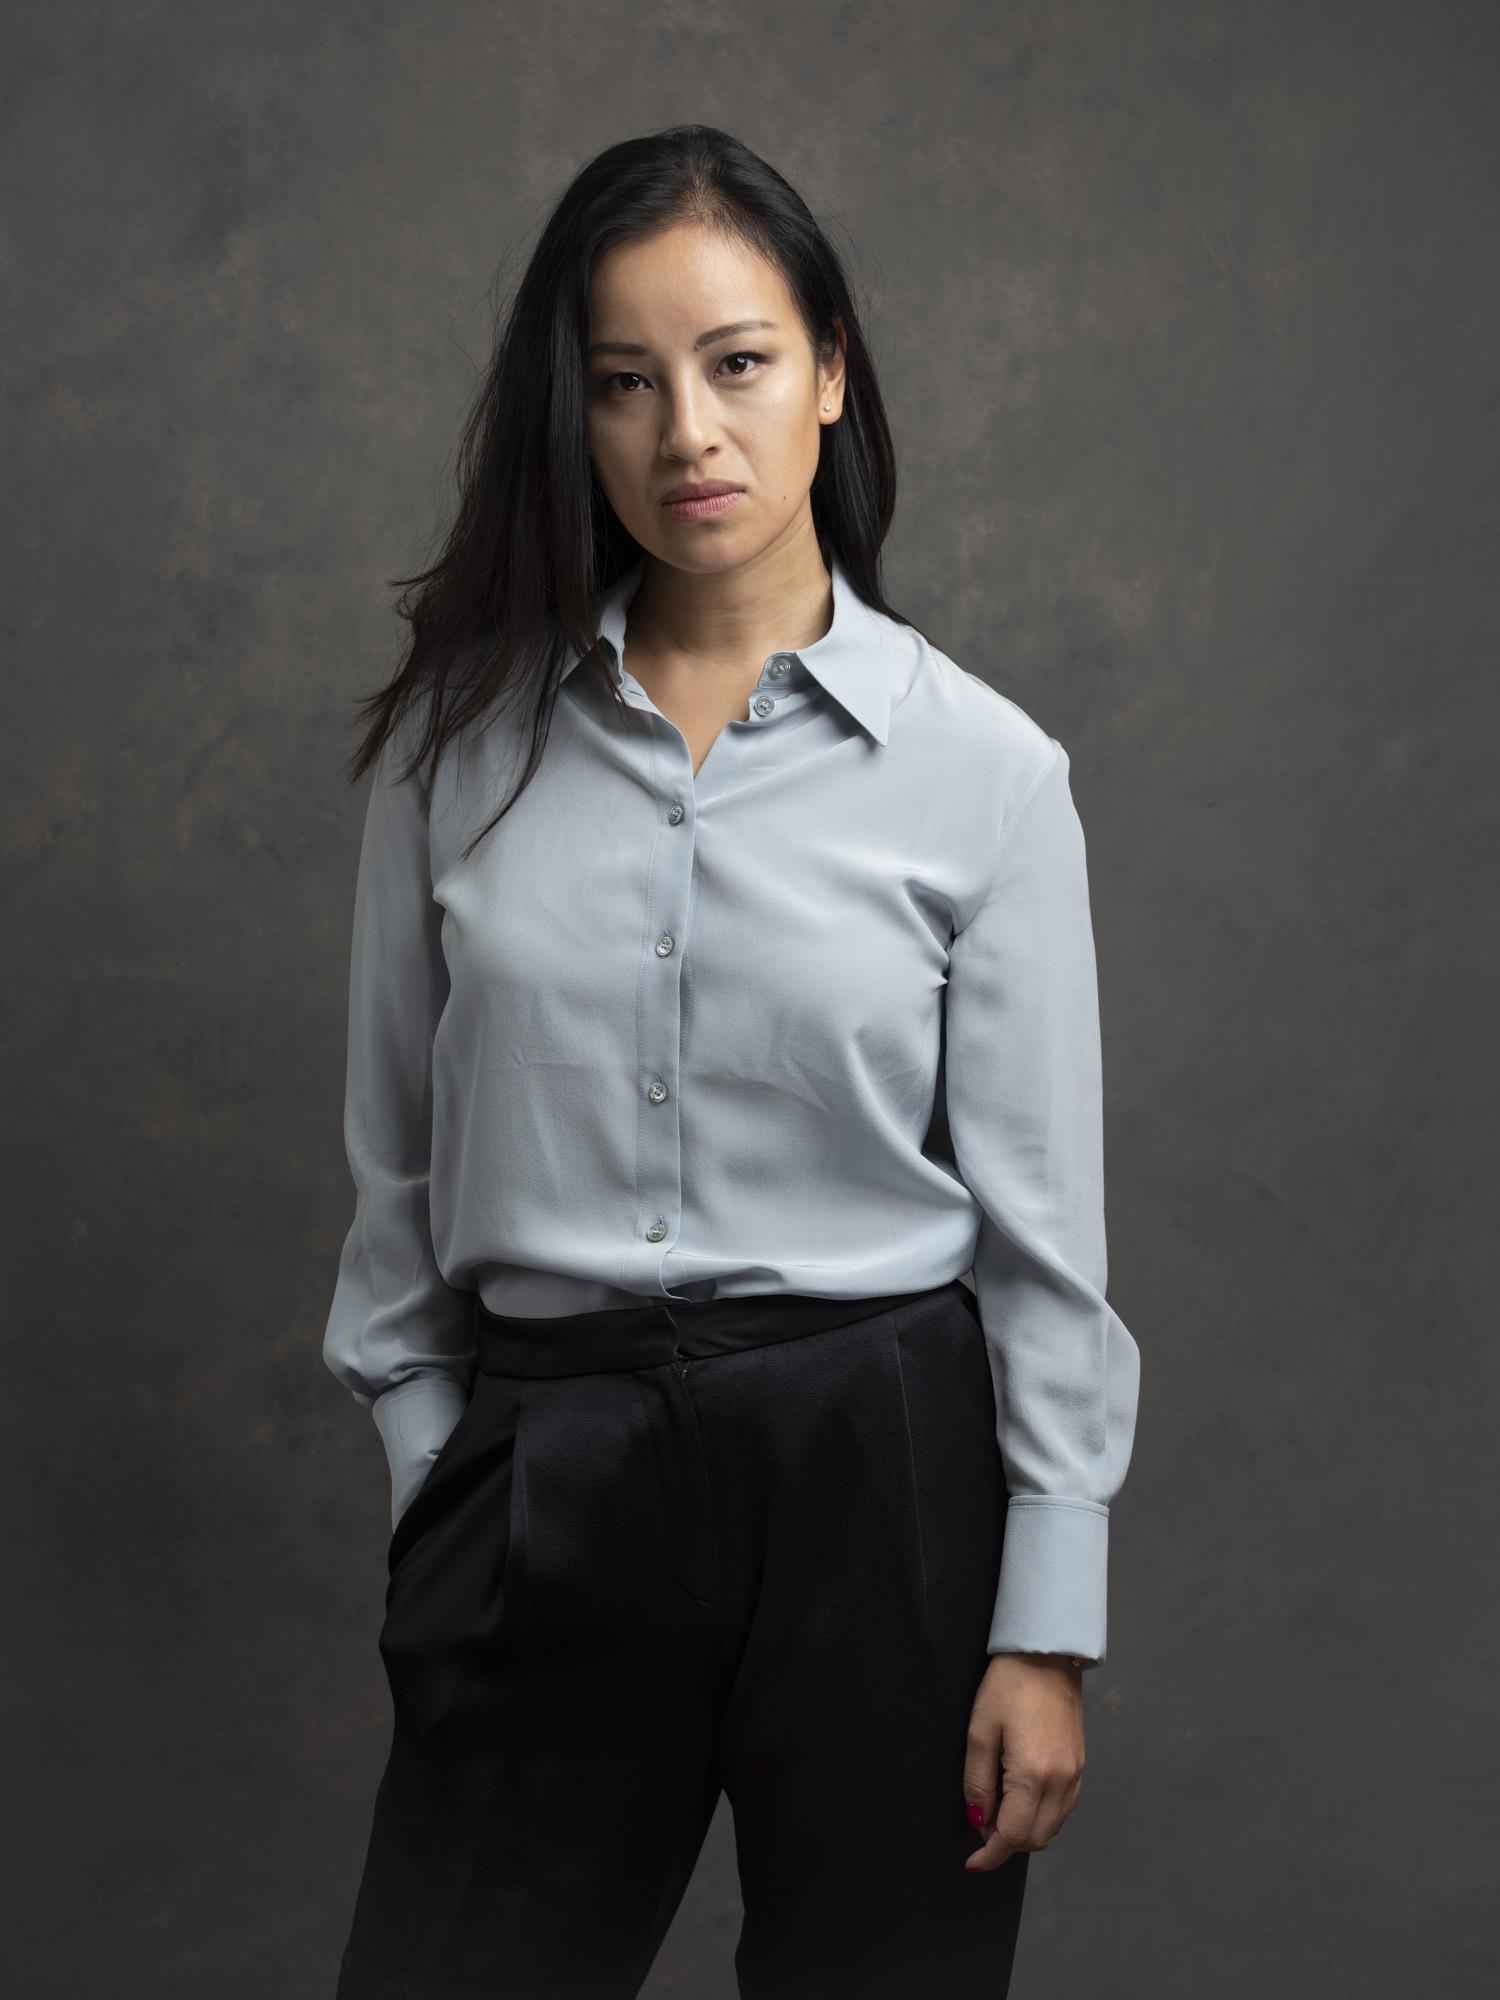 Corporate headshot portrait linkedin profil photography studio singapore services asia photographer grey shirt